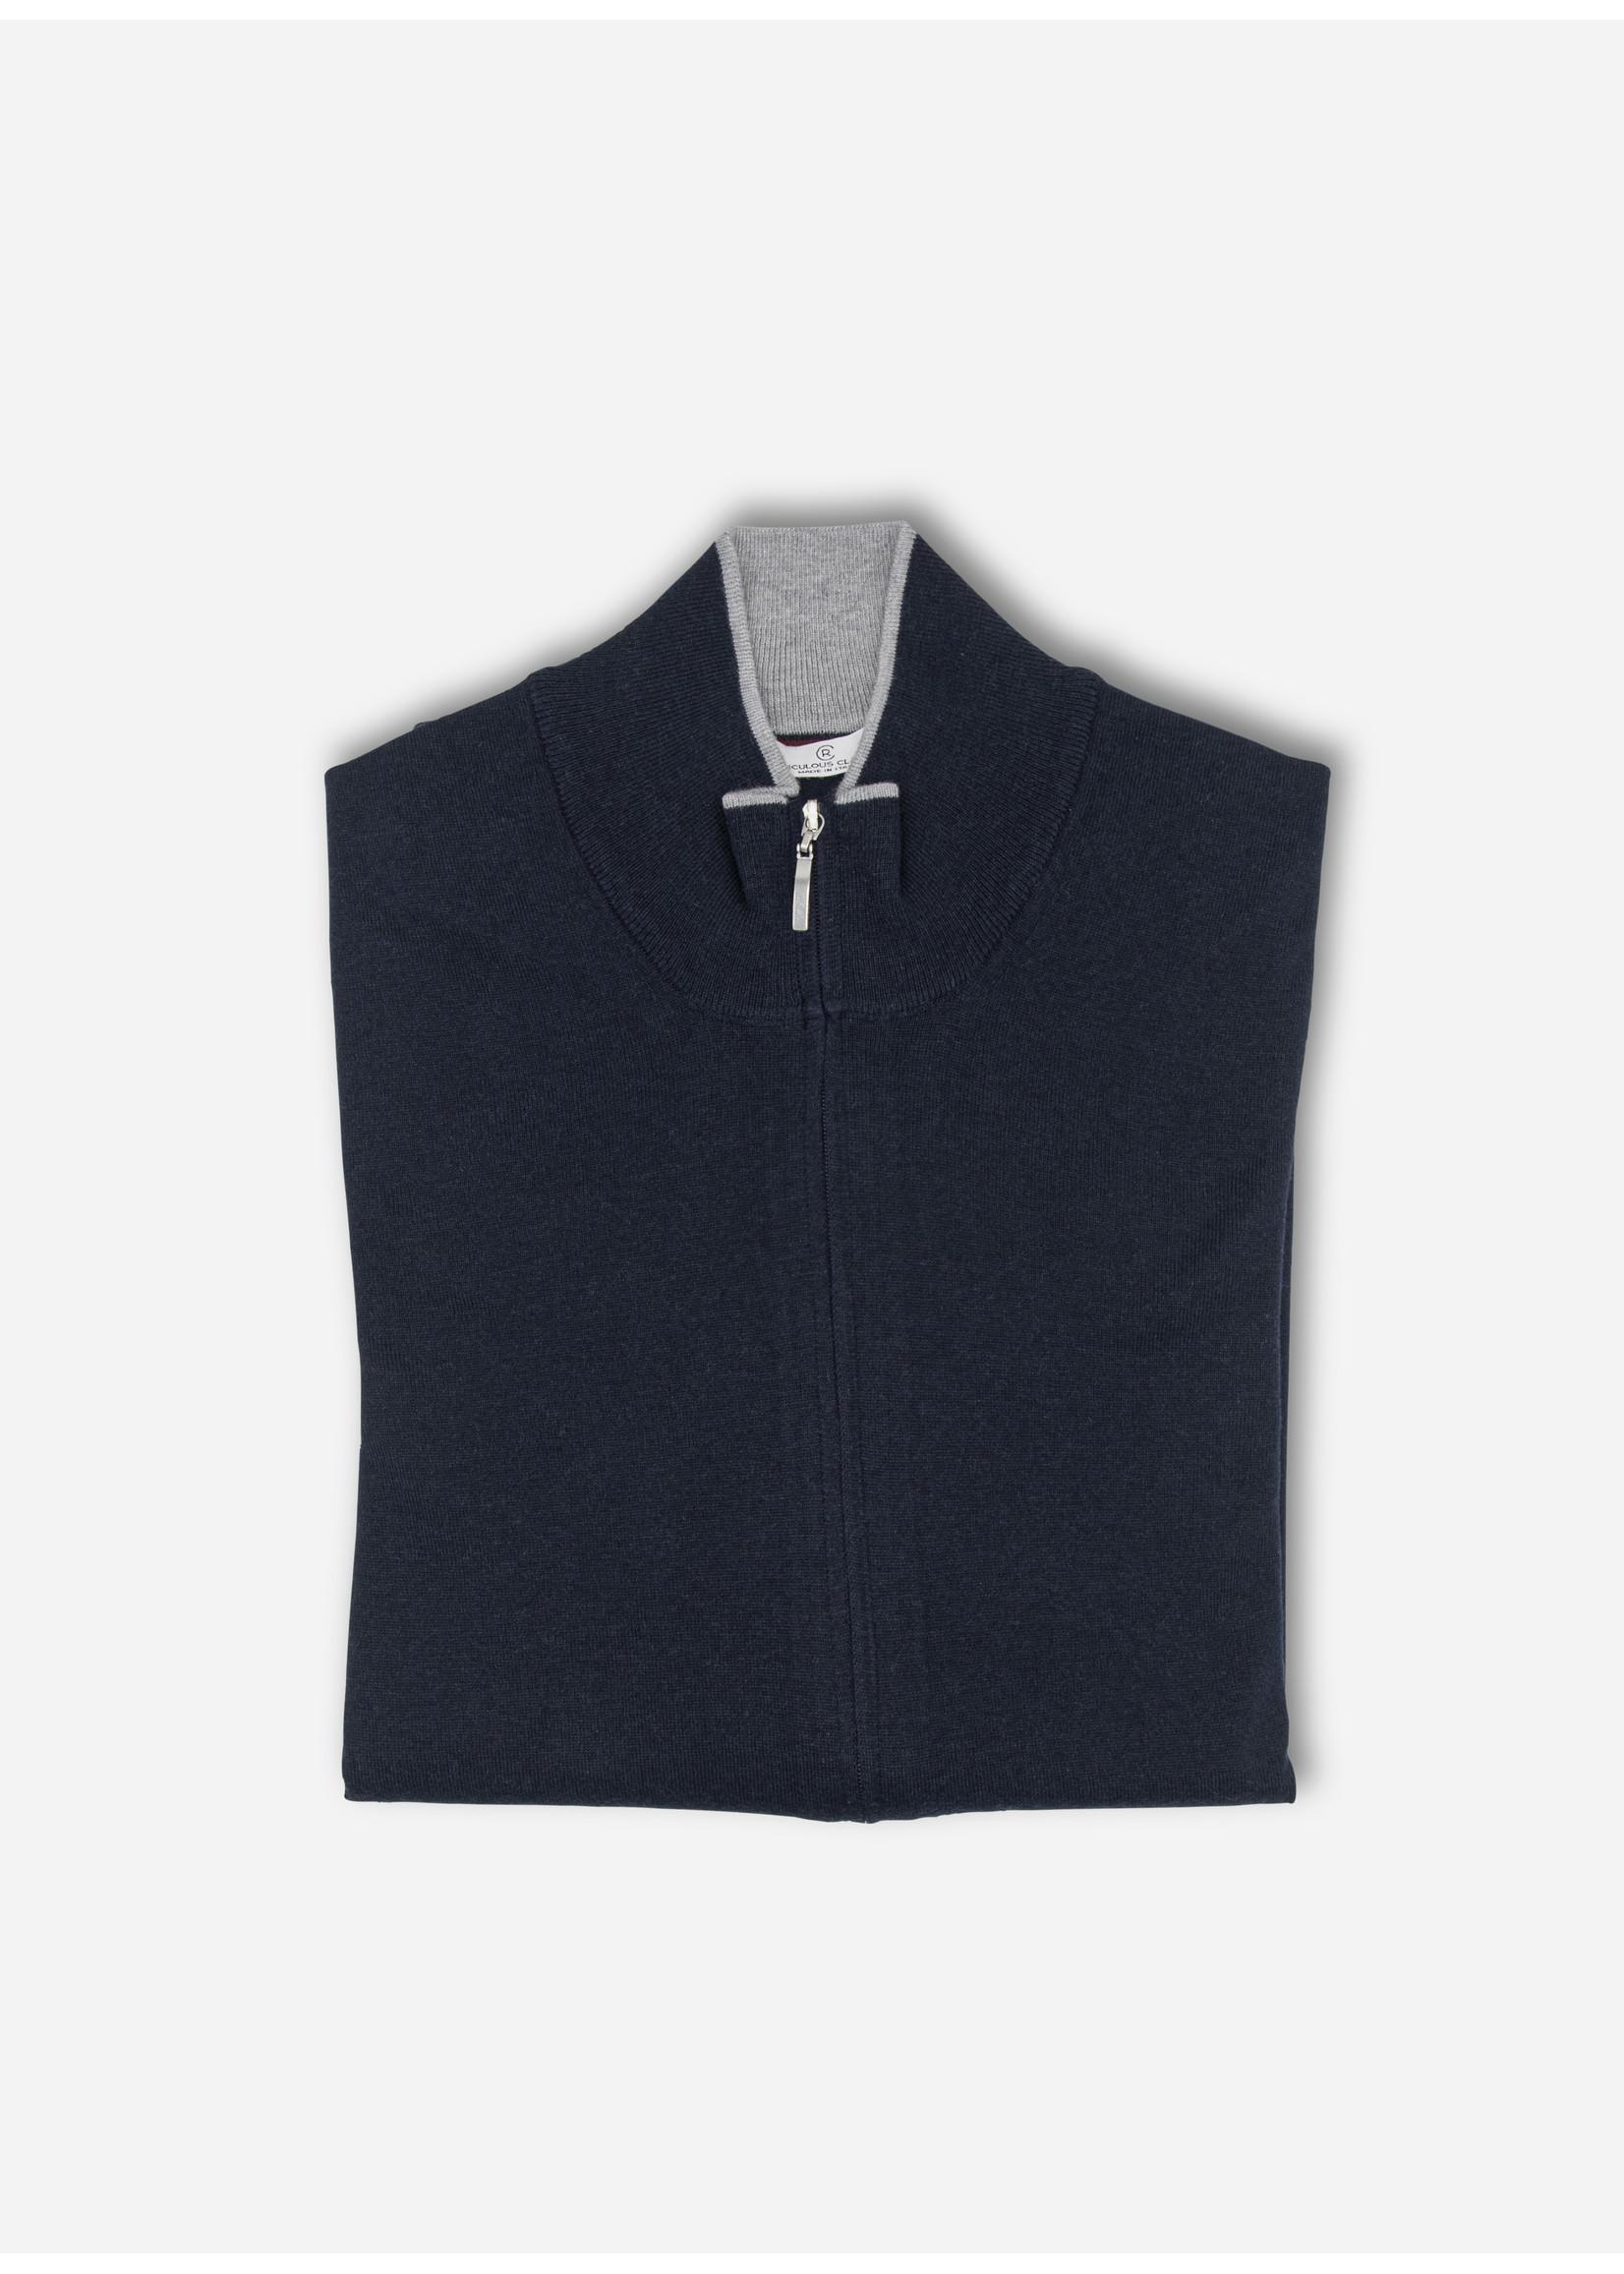 Ridiculous Classic Vest zip navy